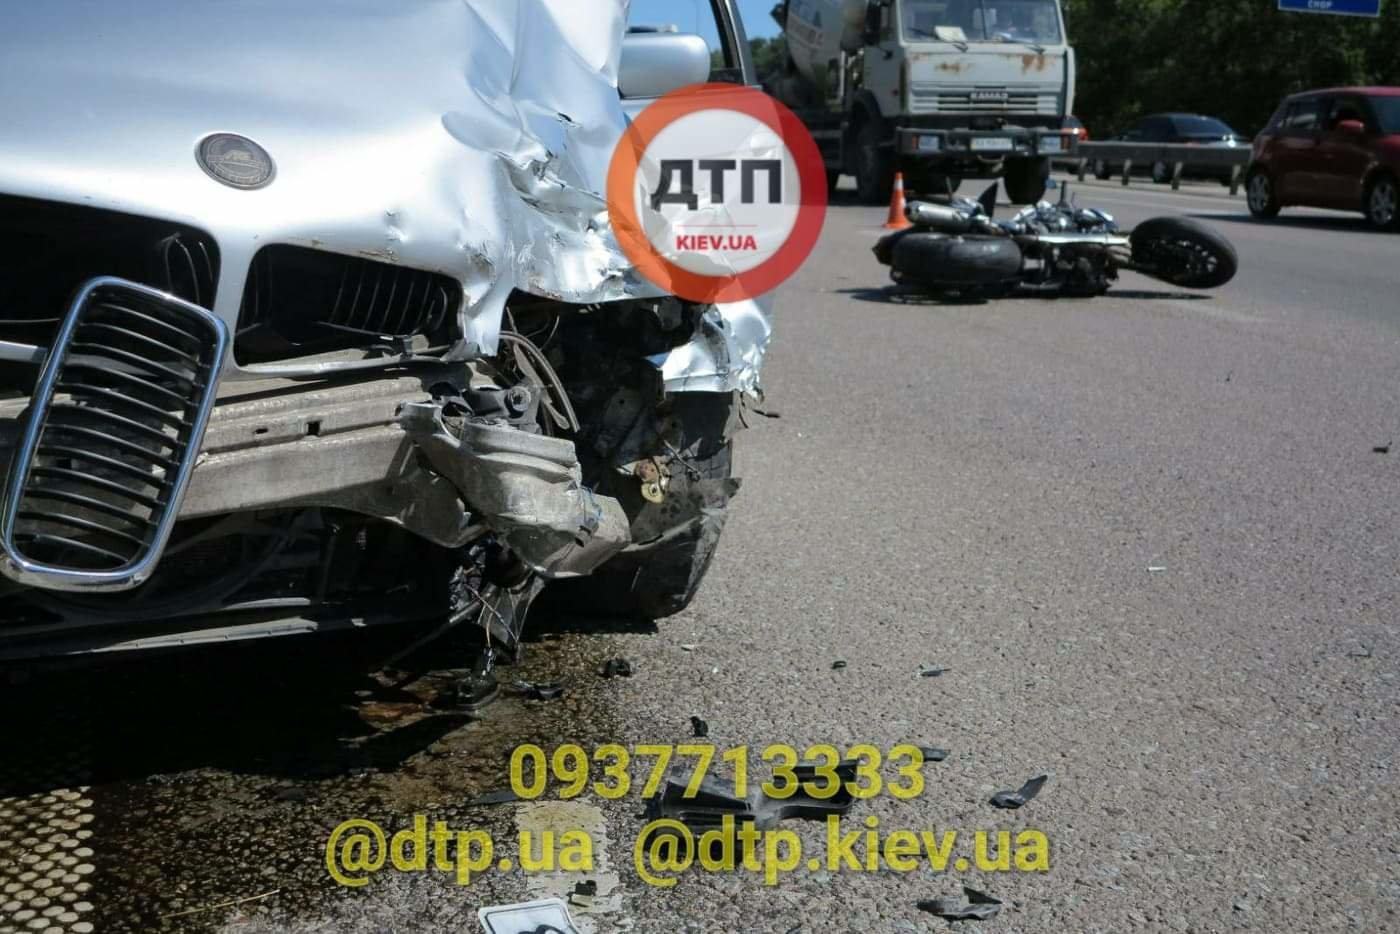 В Киеве произошло серьезное ДТП: легковушка сбила мотоциклиста - ФОТО, фото-3